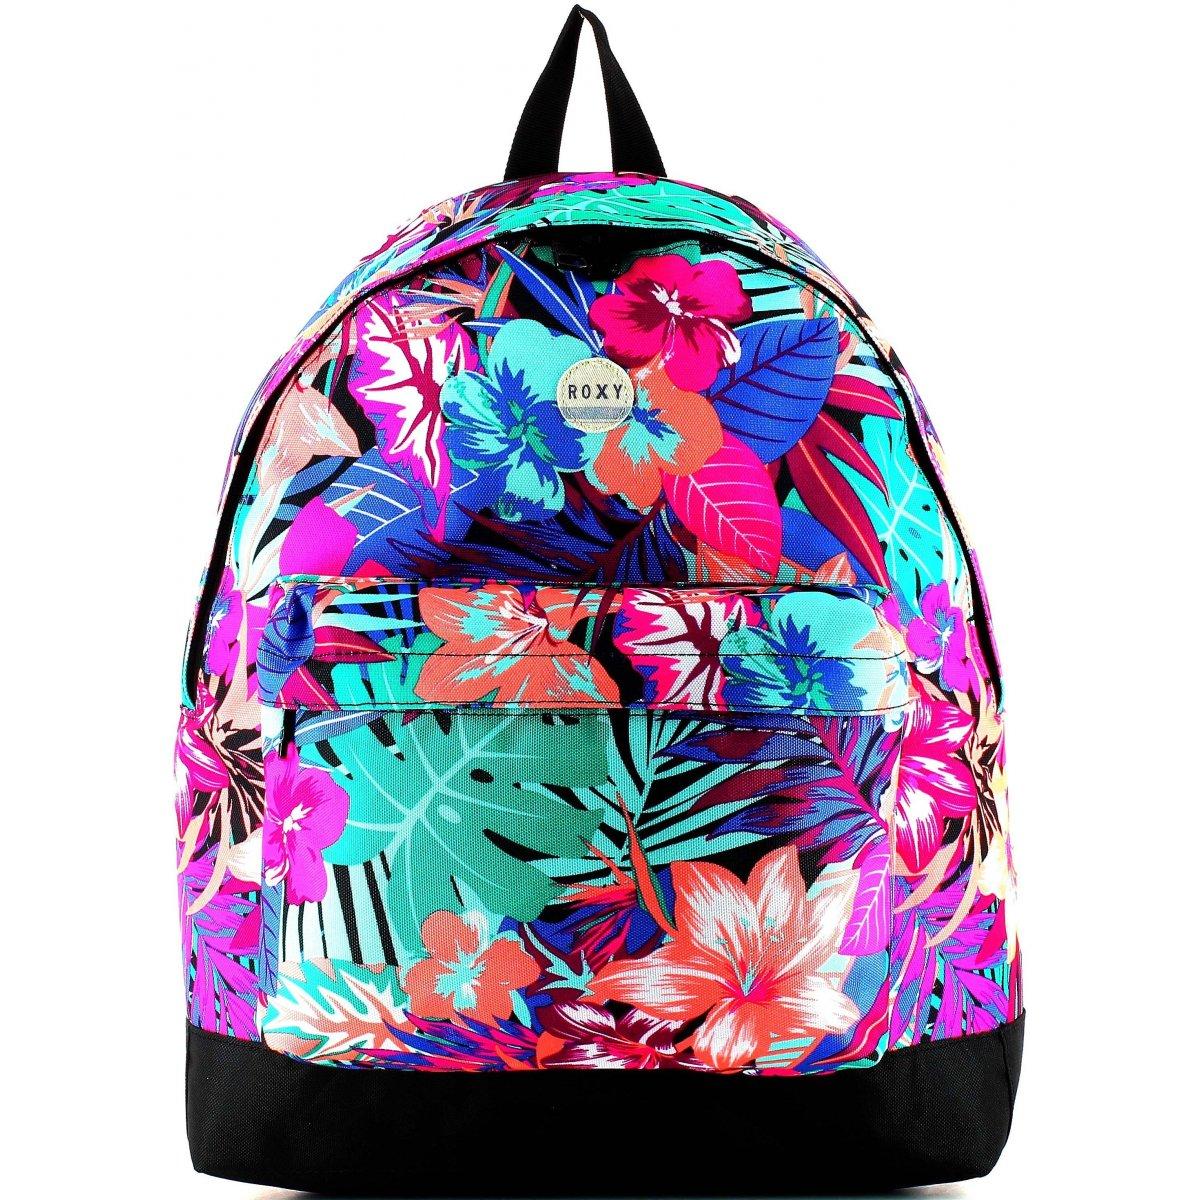 sac dos scolaire roxy p03102kvj6 couleur principale assortis promotion. Black Bedroom Furniture Sets. Home Design Ideas